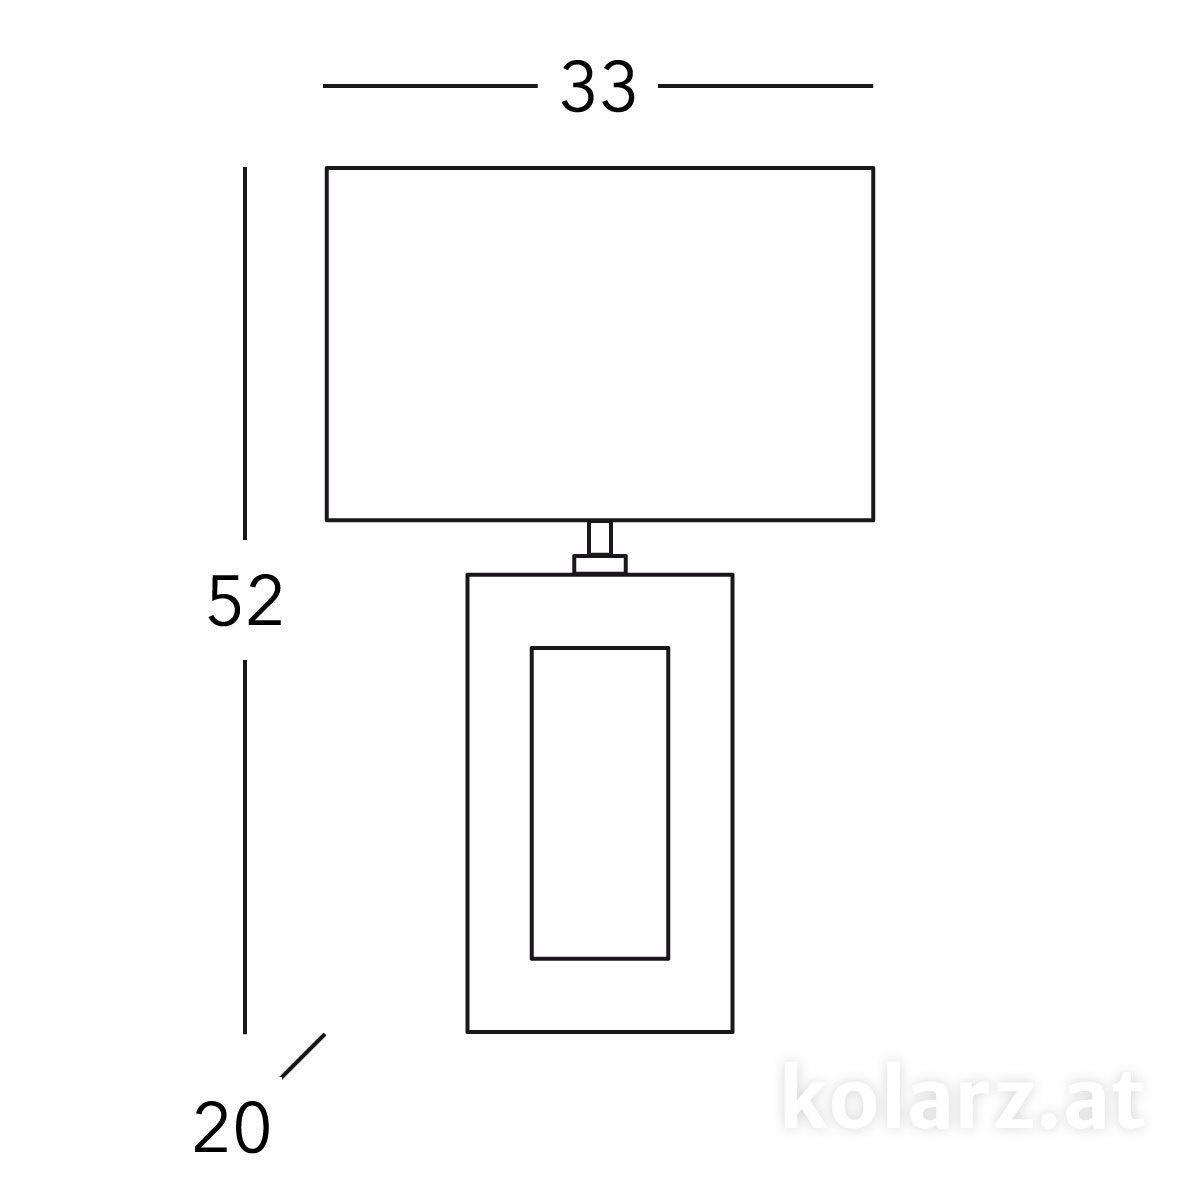 5360-70180__ki50-s1.jpg